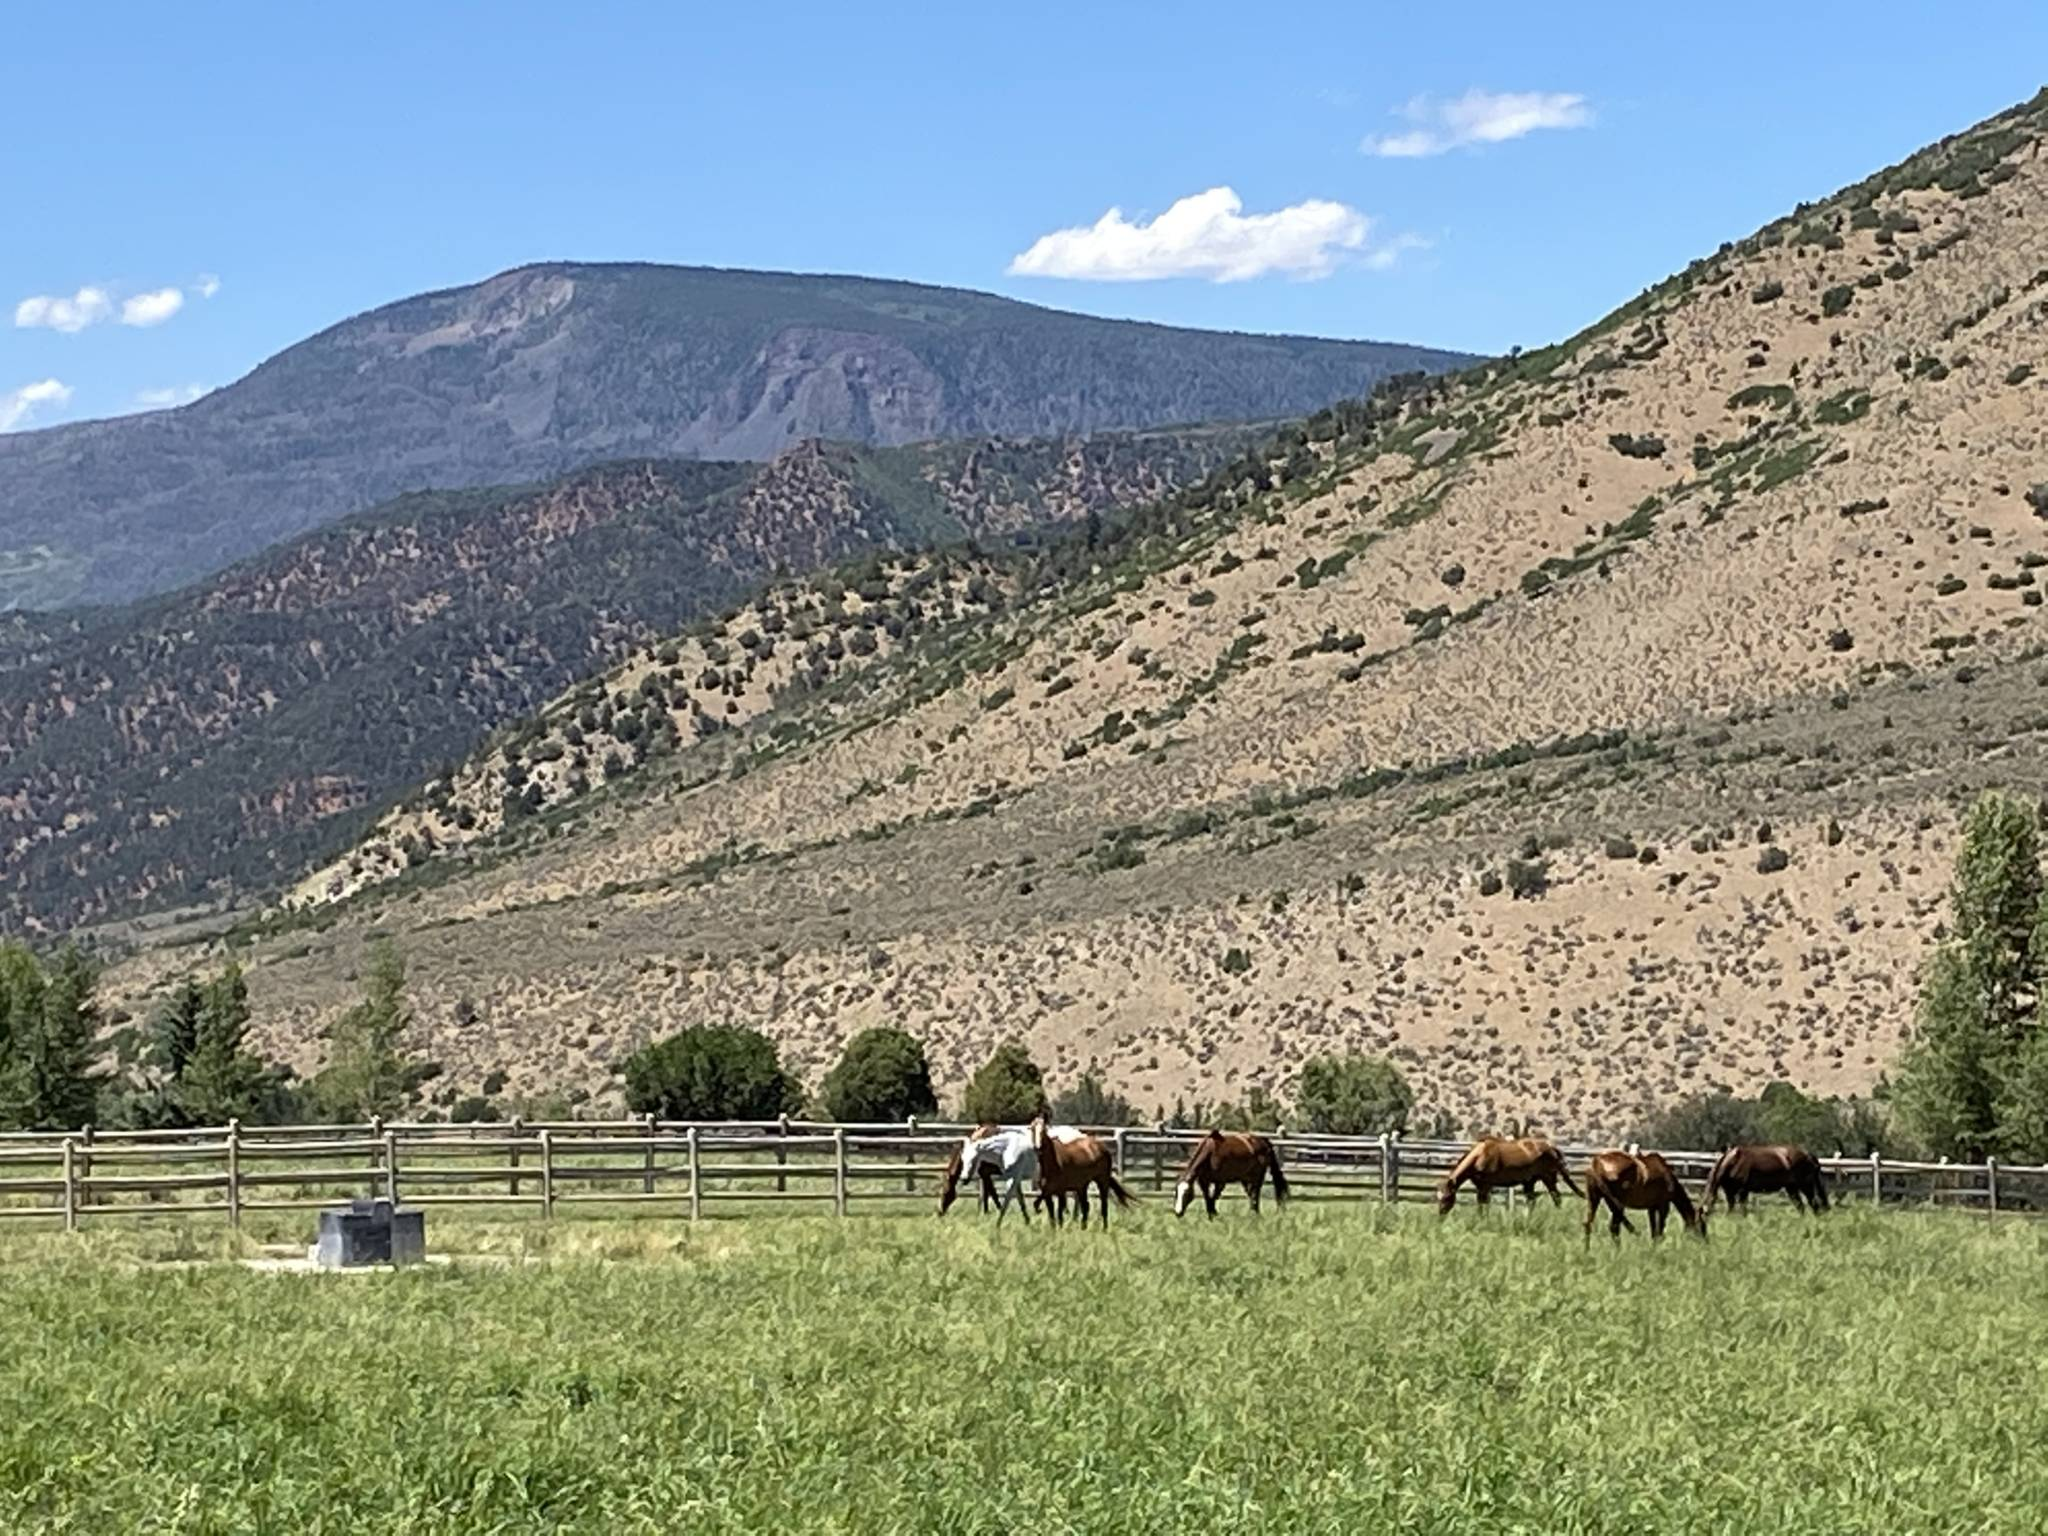 Horses at the Windstar Ranch